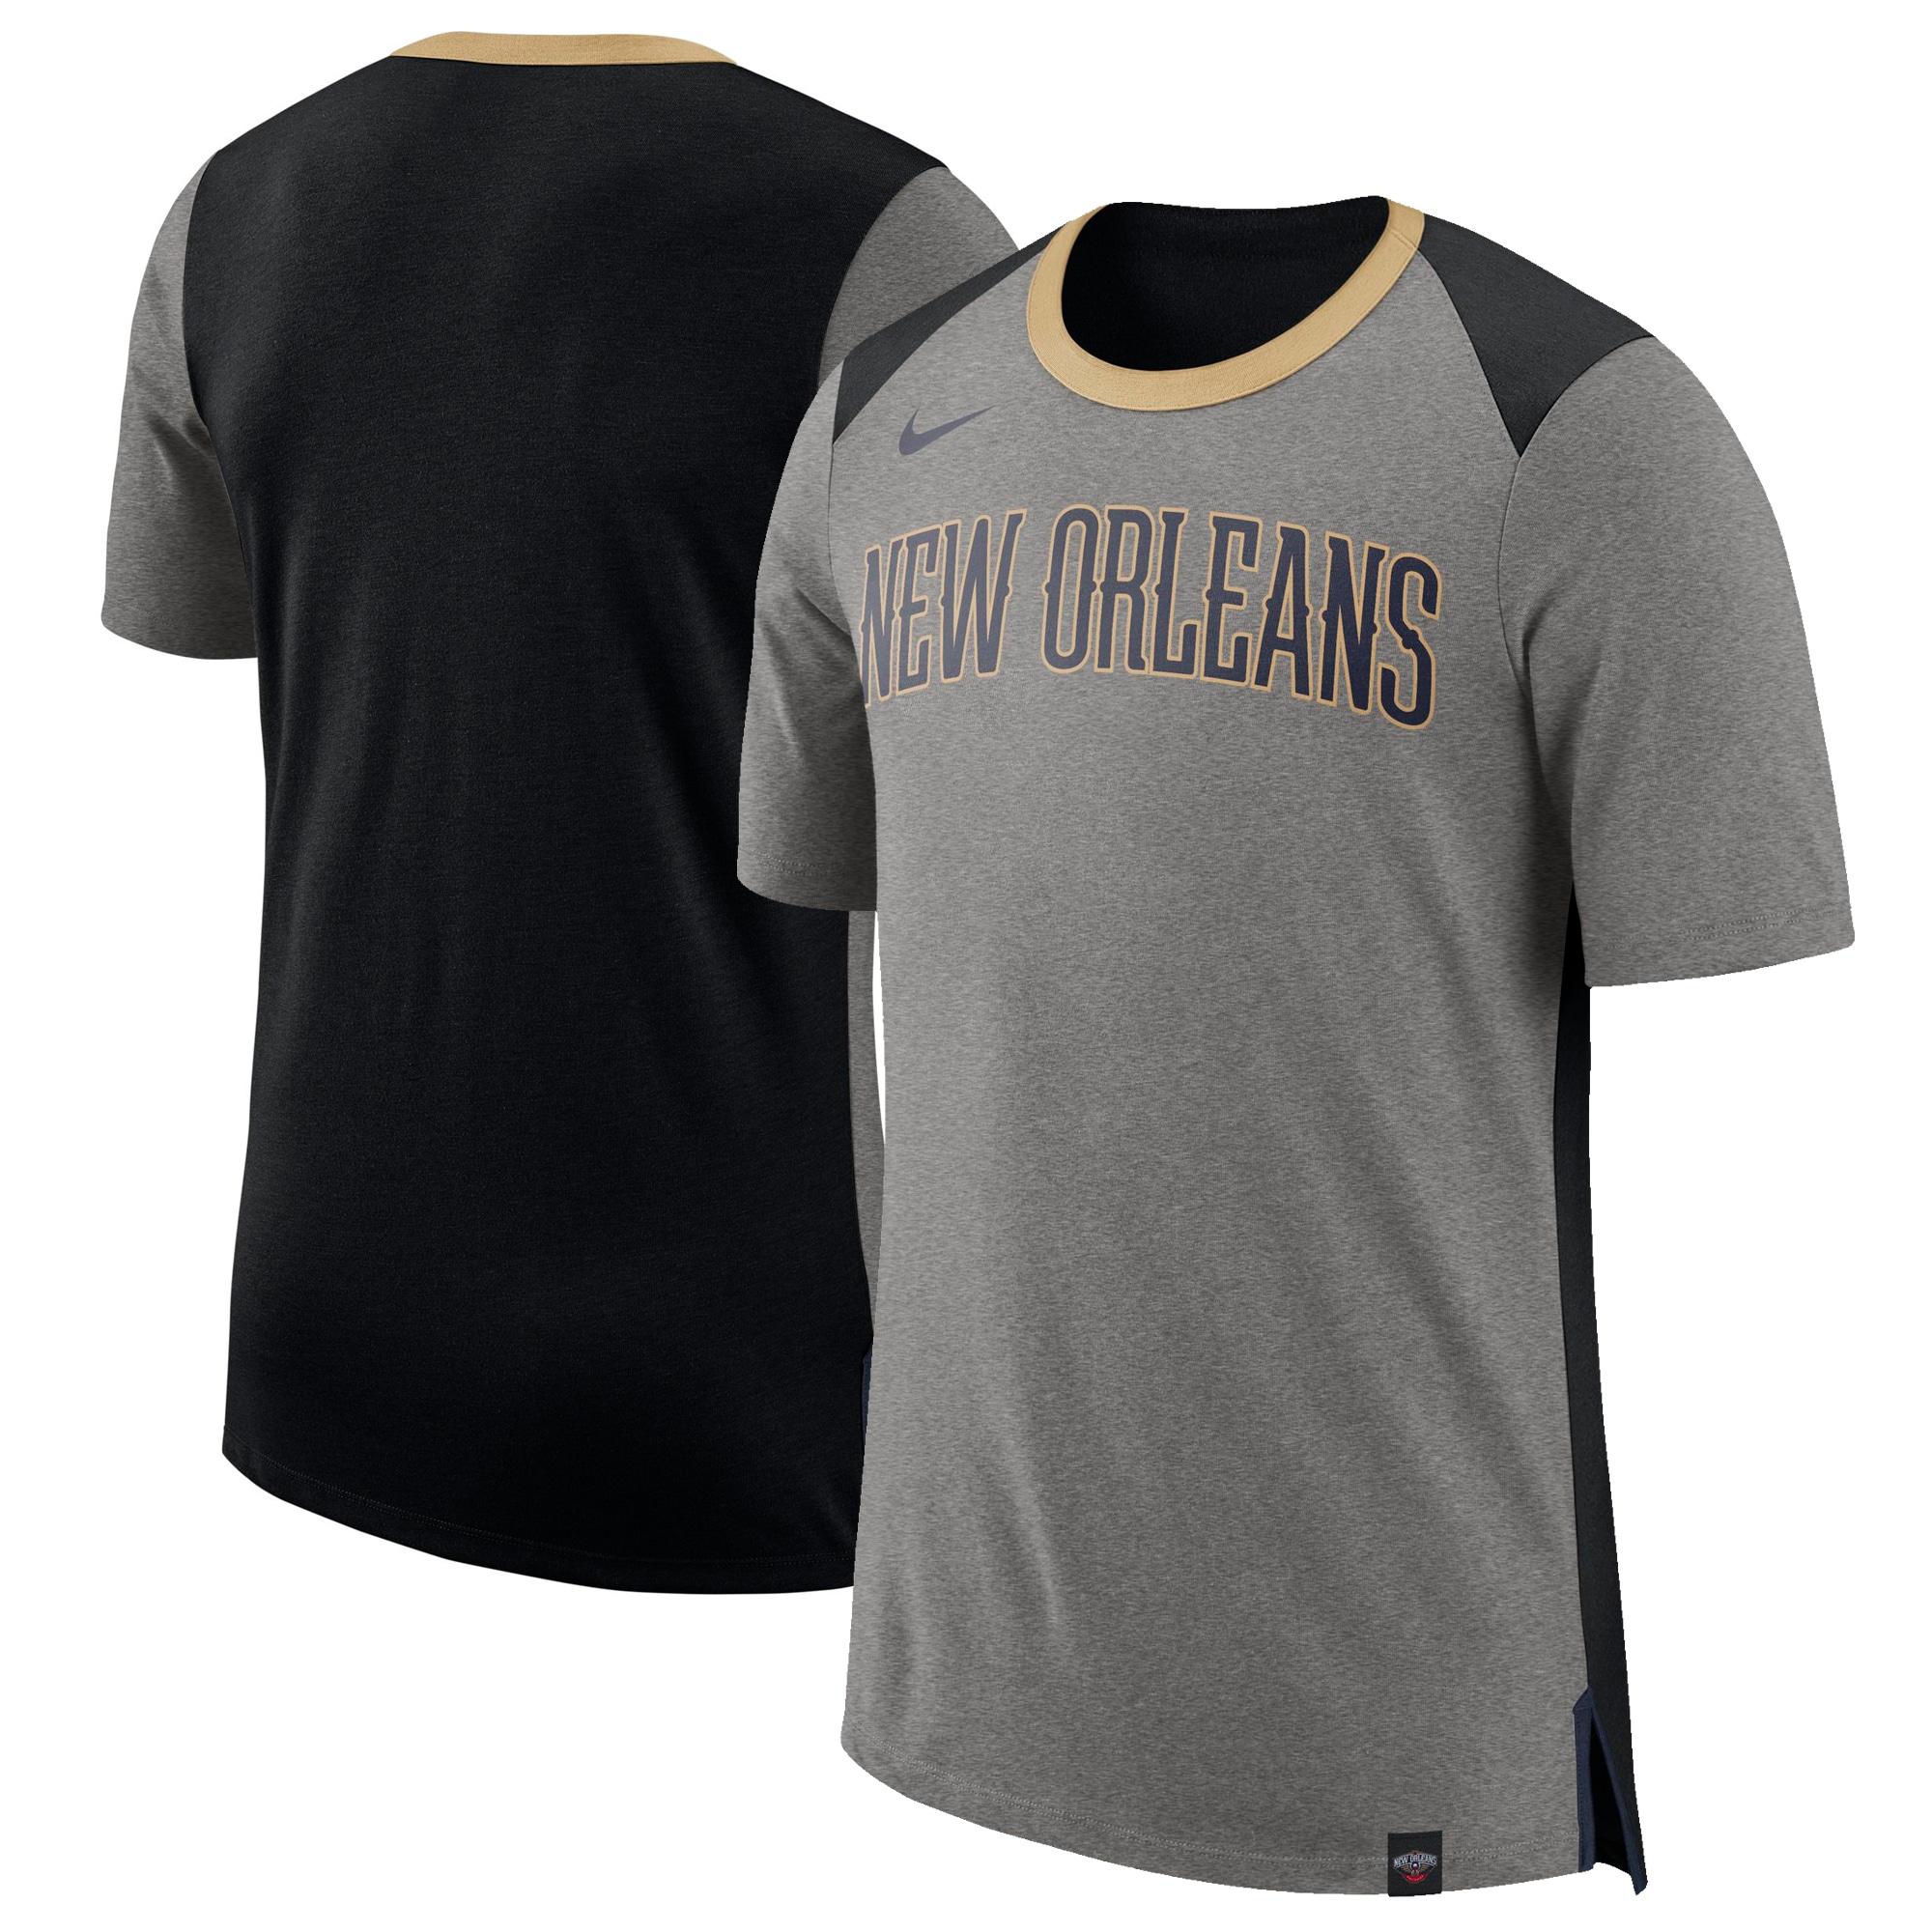 New Orleans Pelicans Nike Basketball Fan T-Shirt - Gray